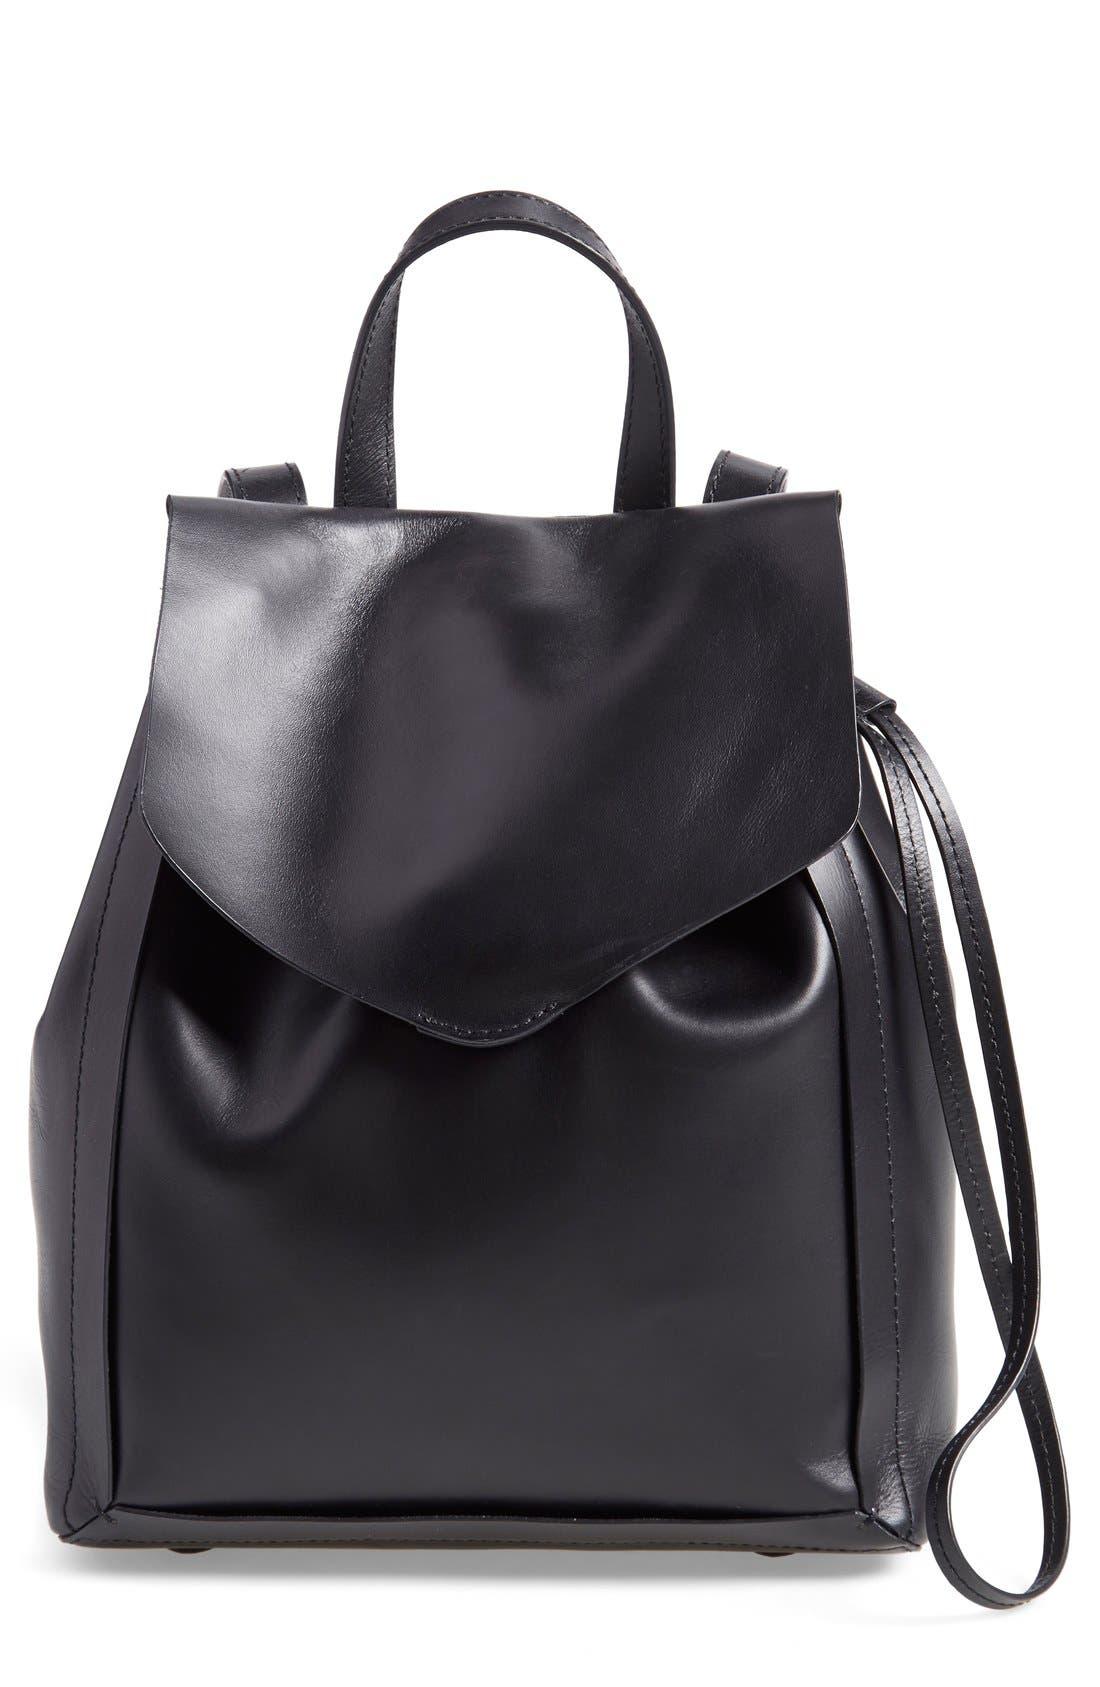 Alternate Image 1 Selected - Loeffler Randall 'Mini' Leather Backpack